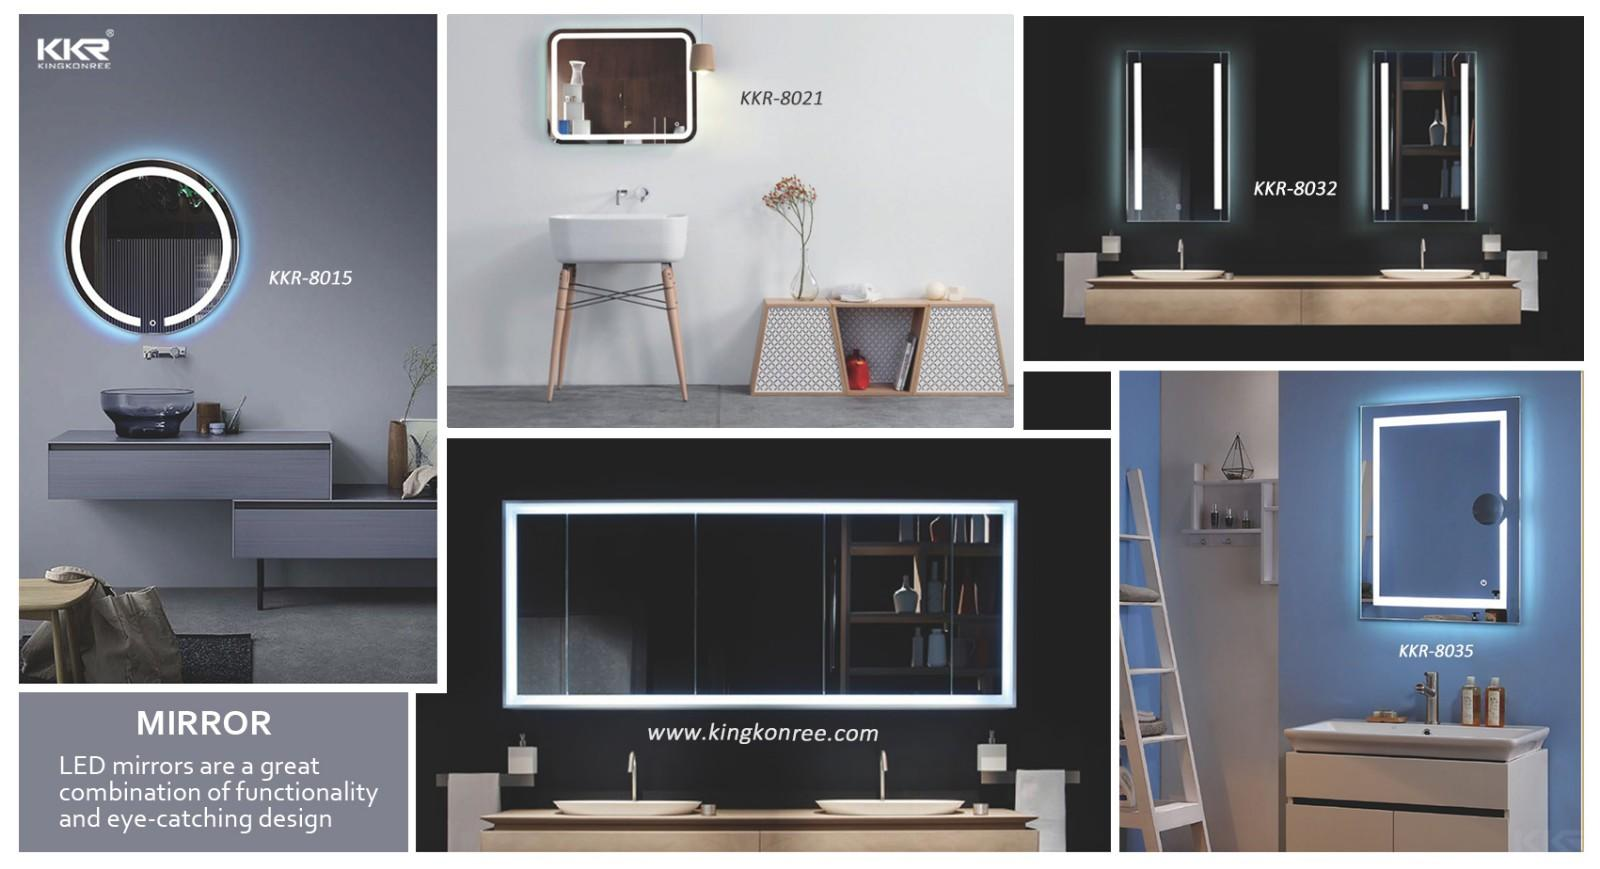 KingKonree classic wall mounted mirror supplier for hotel-2